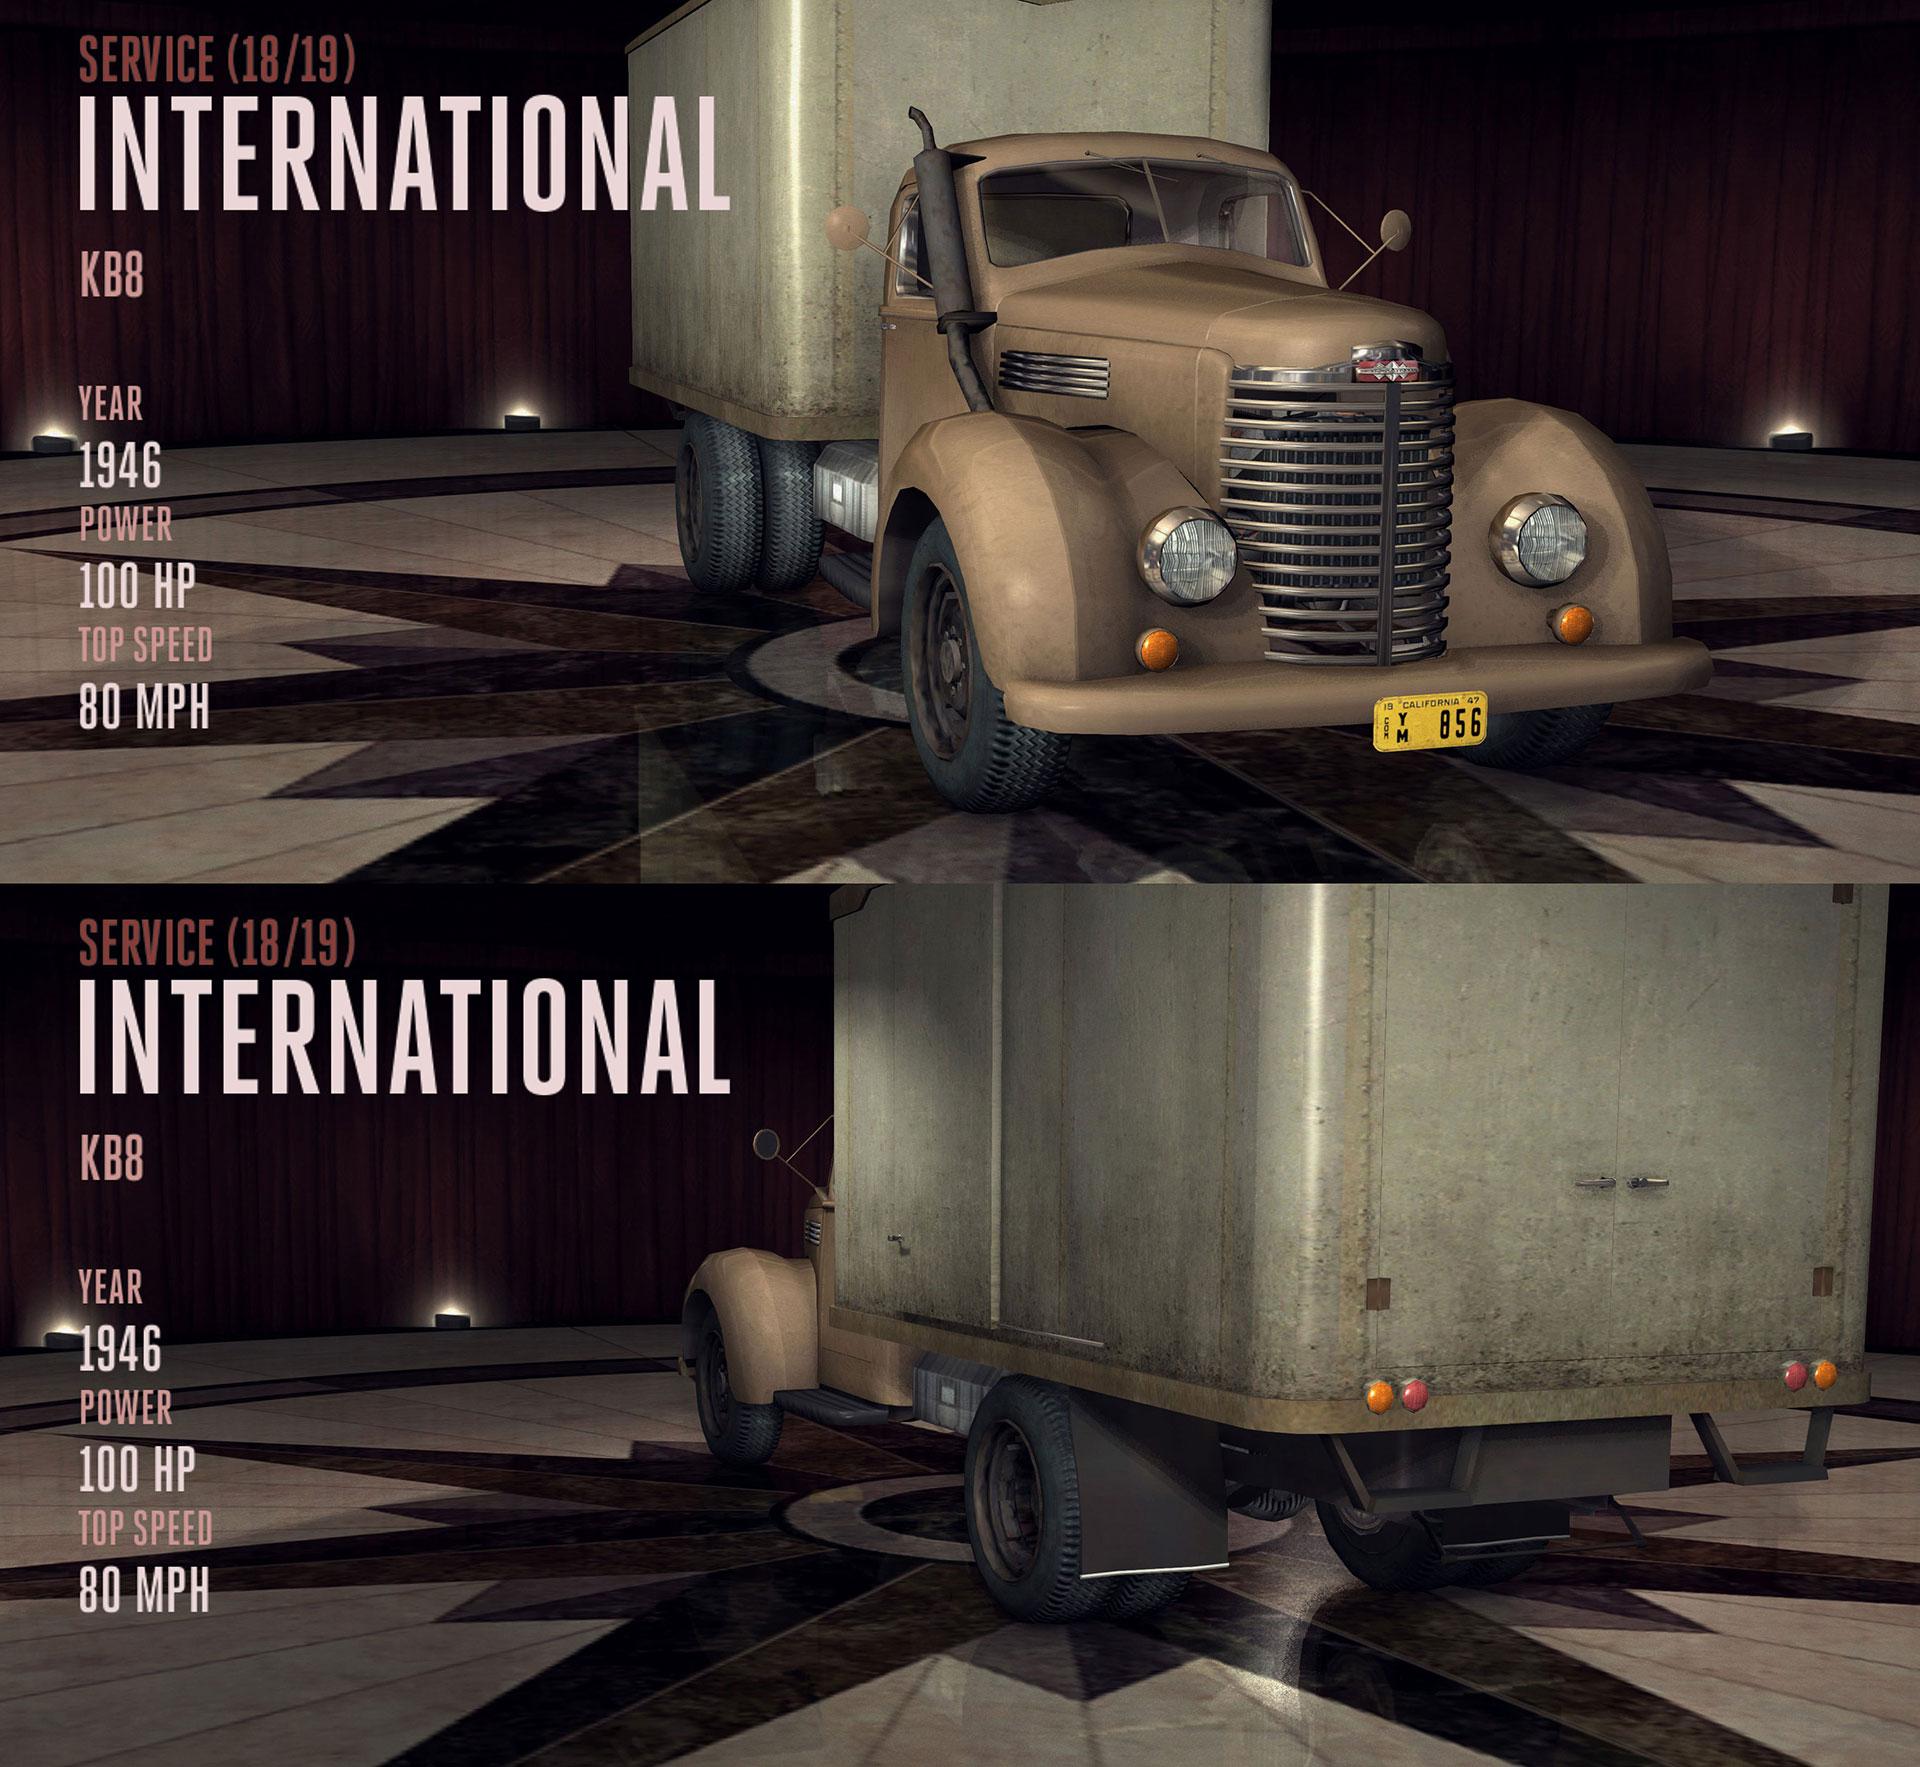 Archivo:1946-international-kb8.jpg